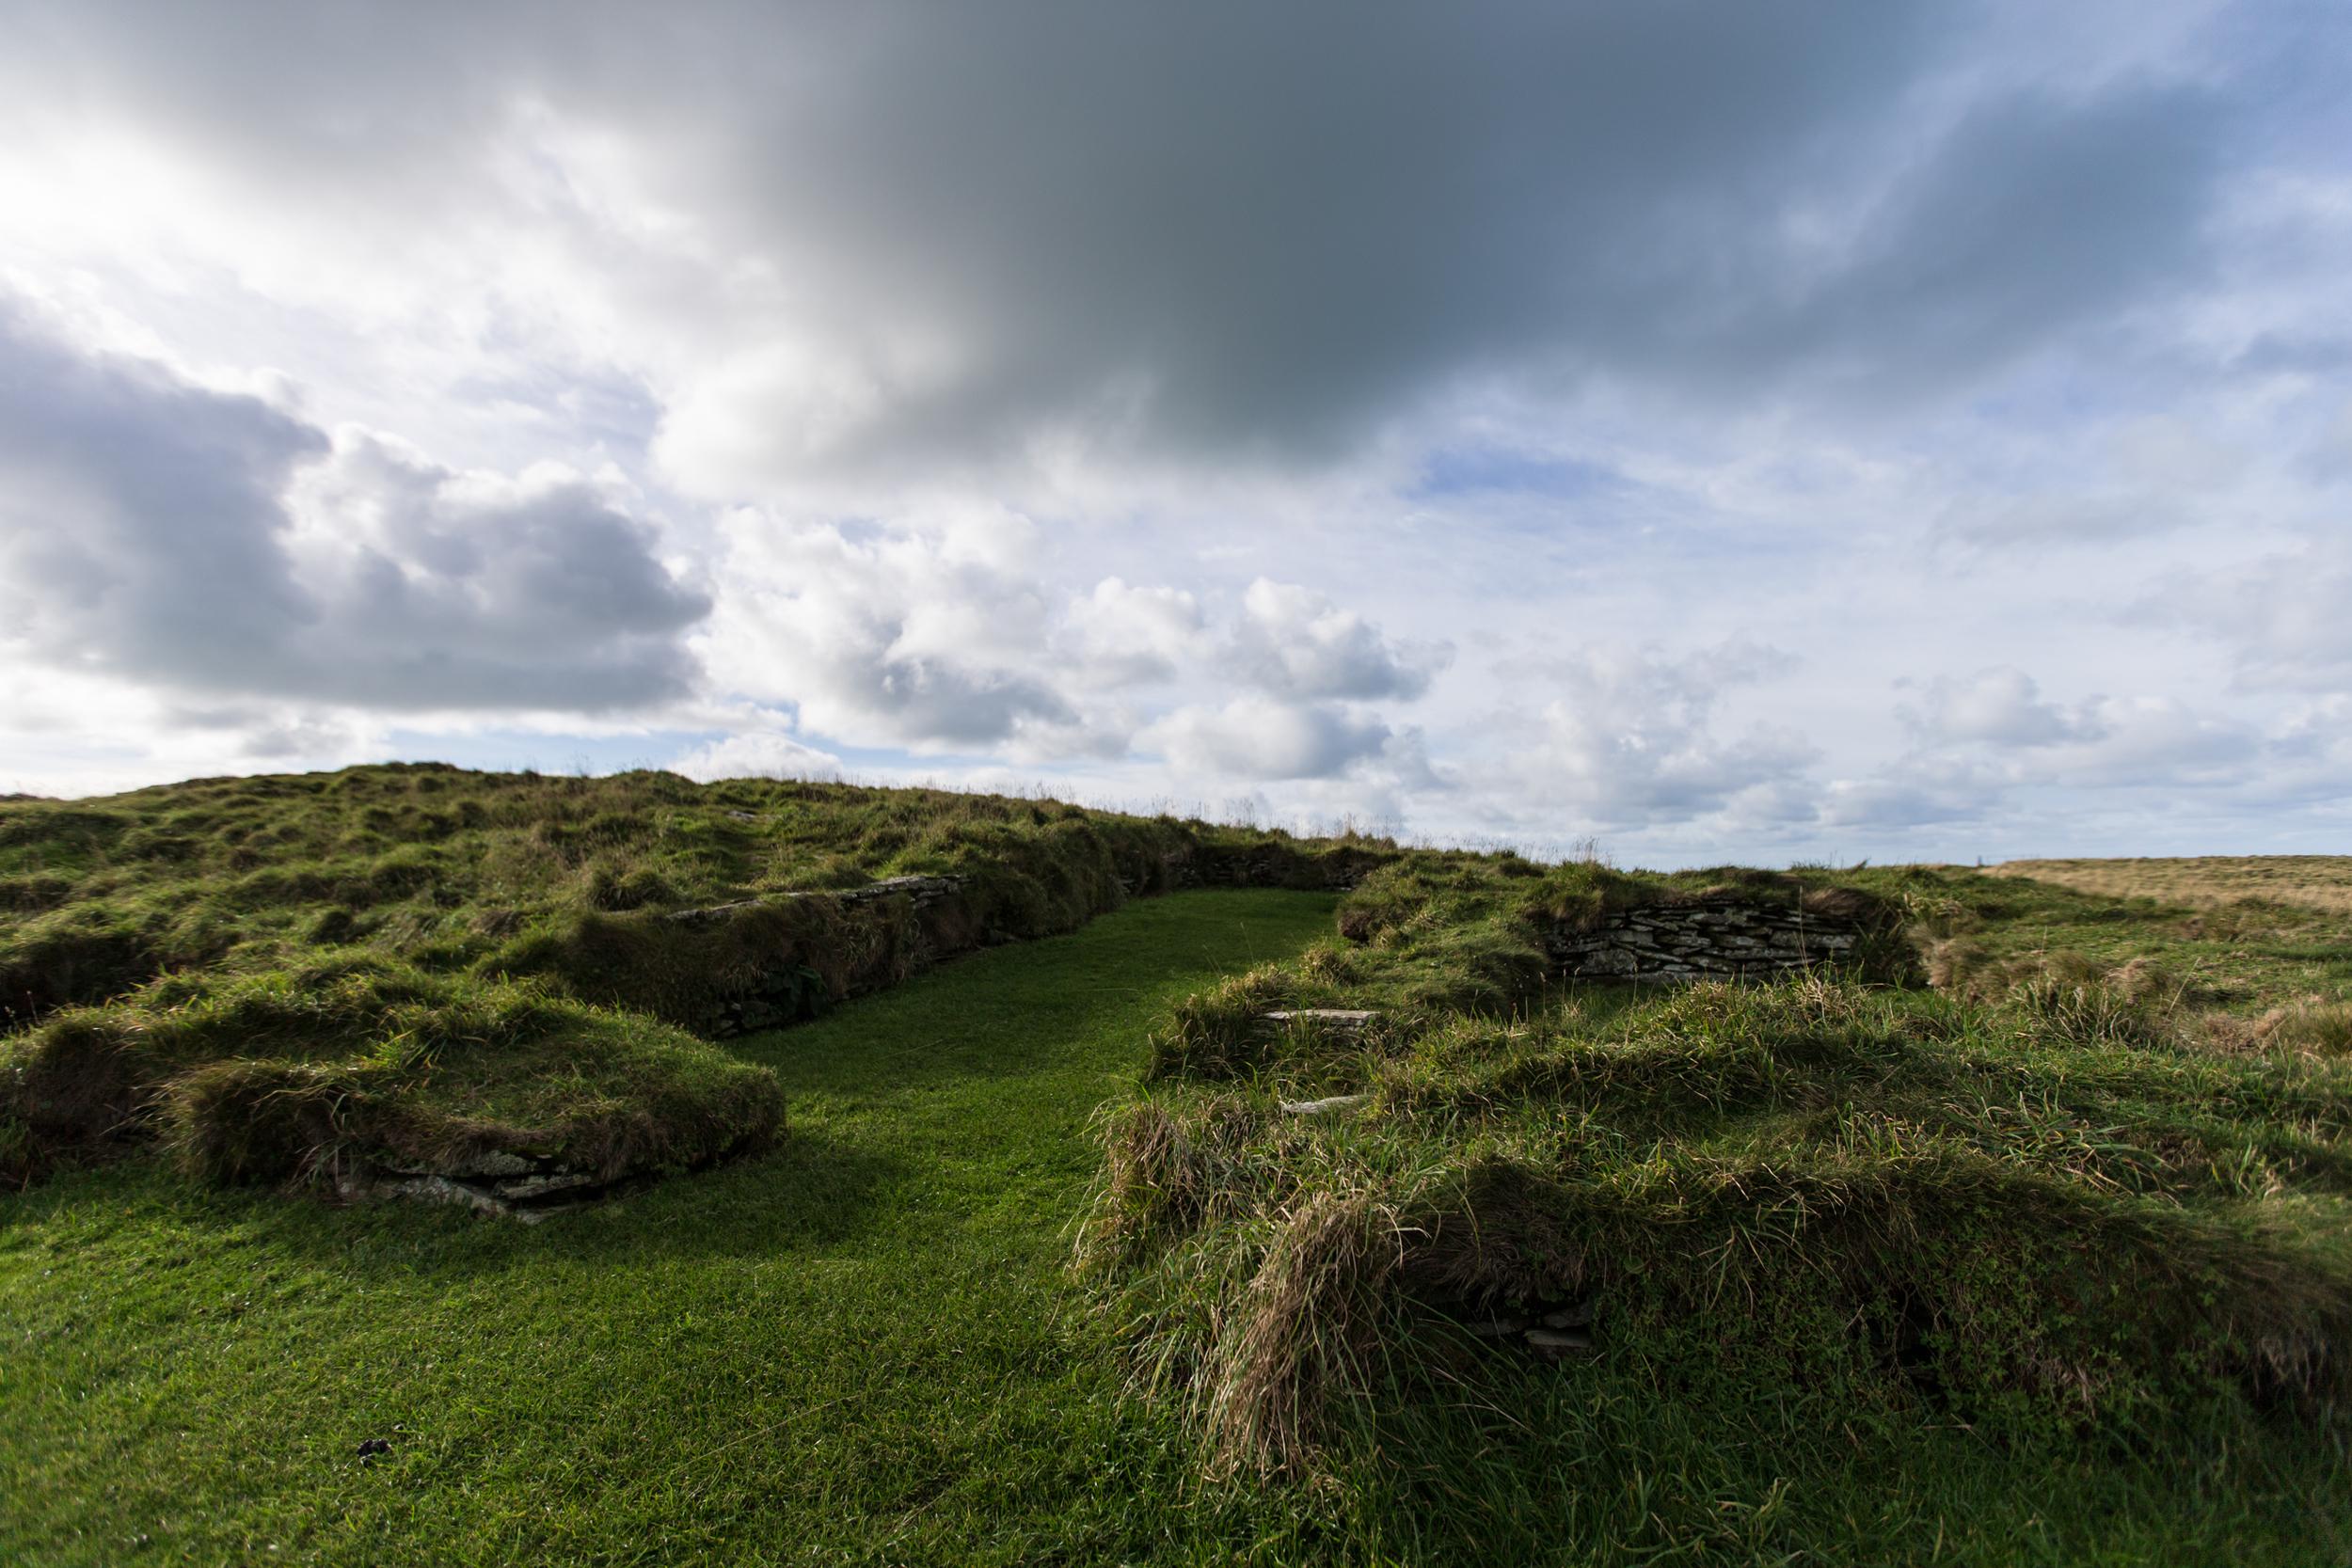 ©Jennifer Bailey 2013 Tintagel Castle, Cornwall, England